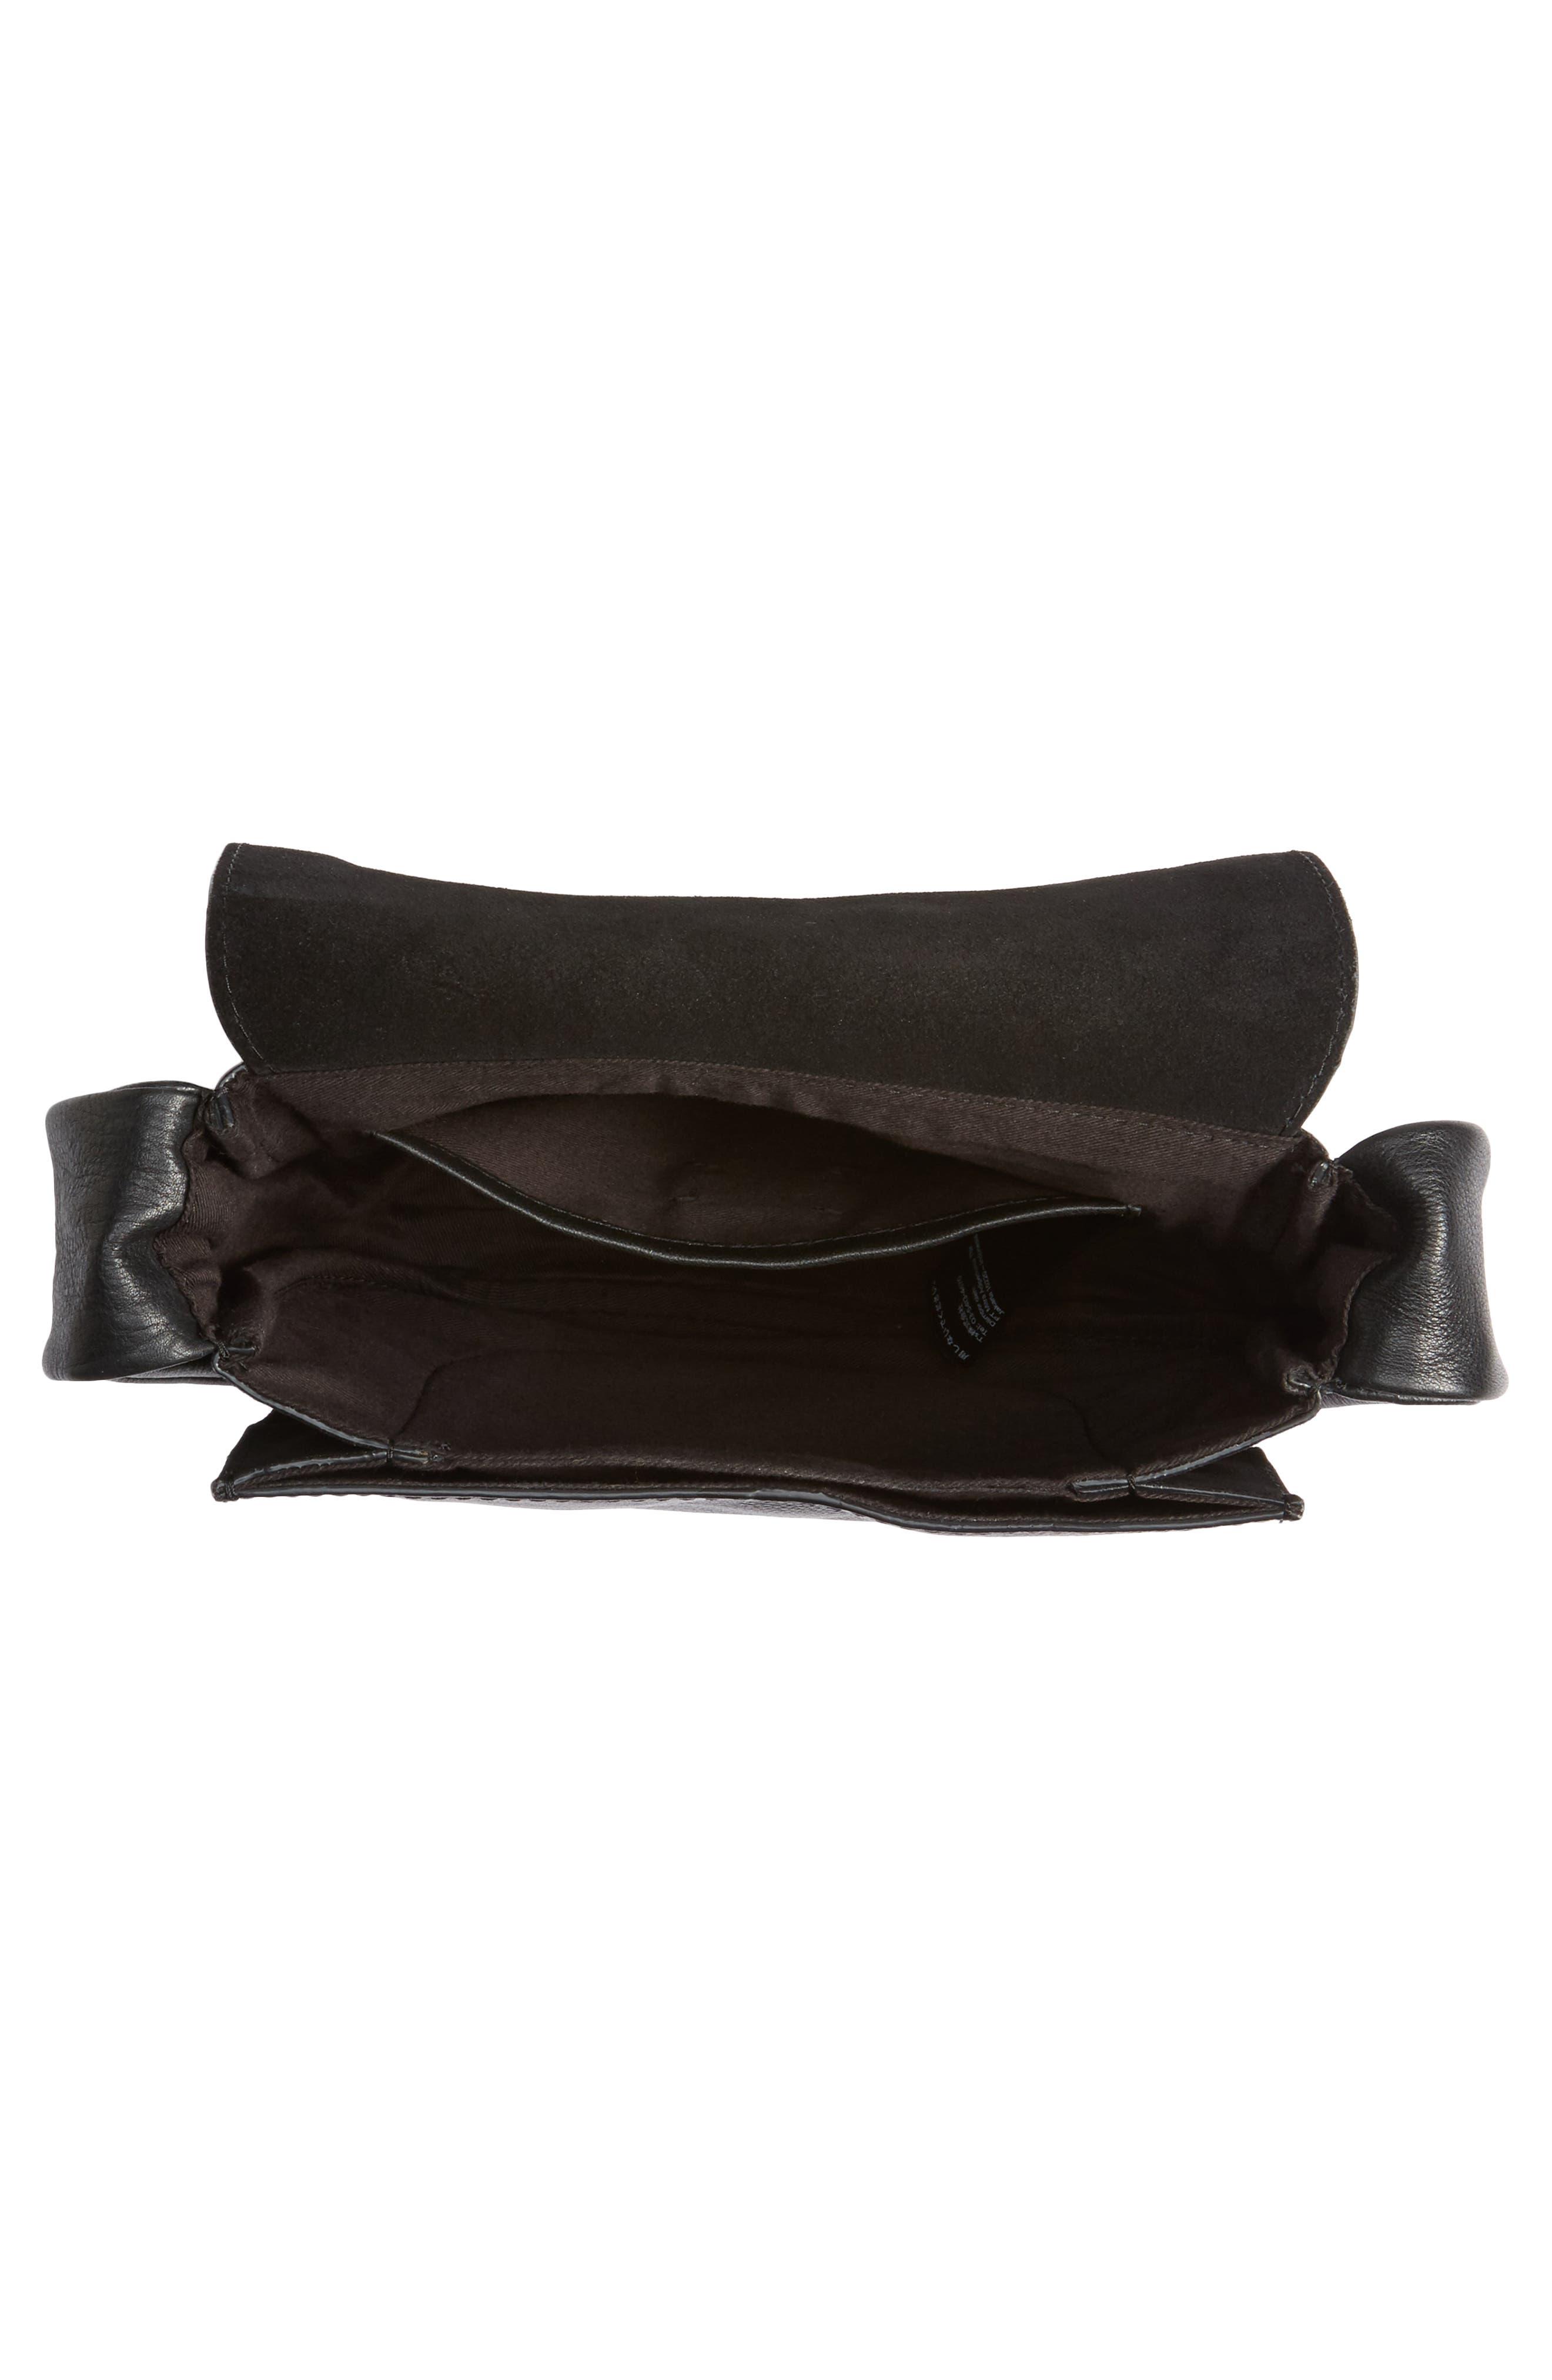 Jasmine Leather Saddle Bag,                             Alternate thumbnail 5, color,                             Black